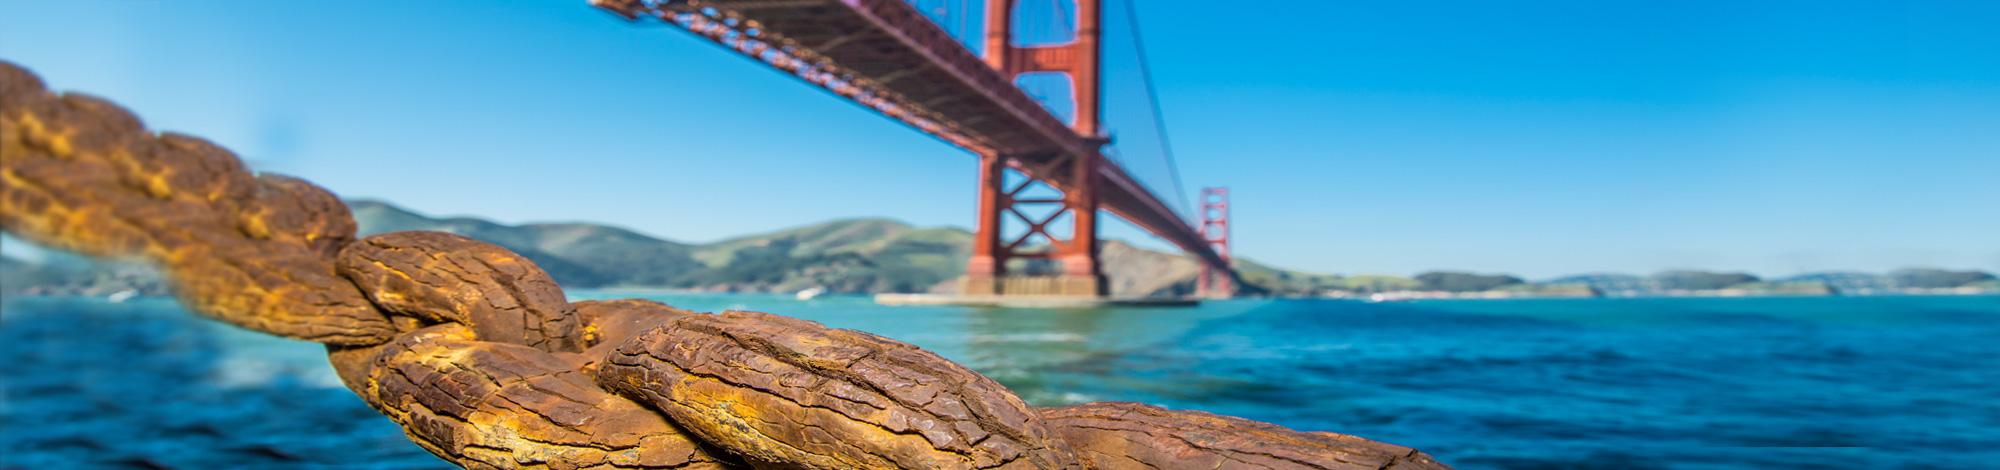 Arcadlon Hilft - Golden Gate